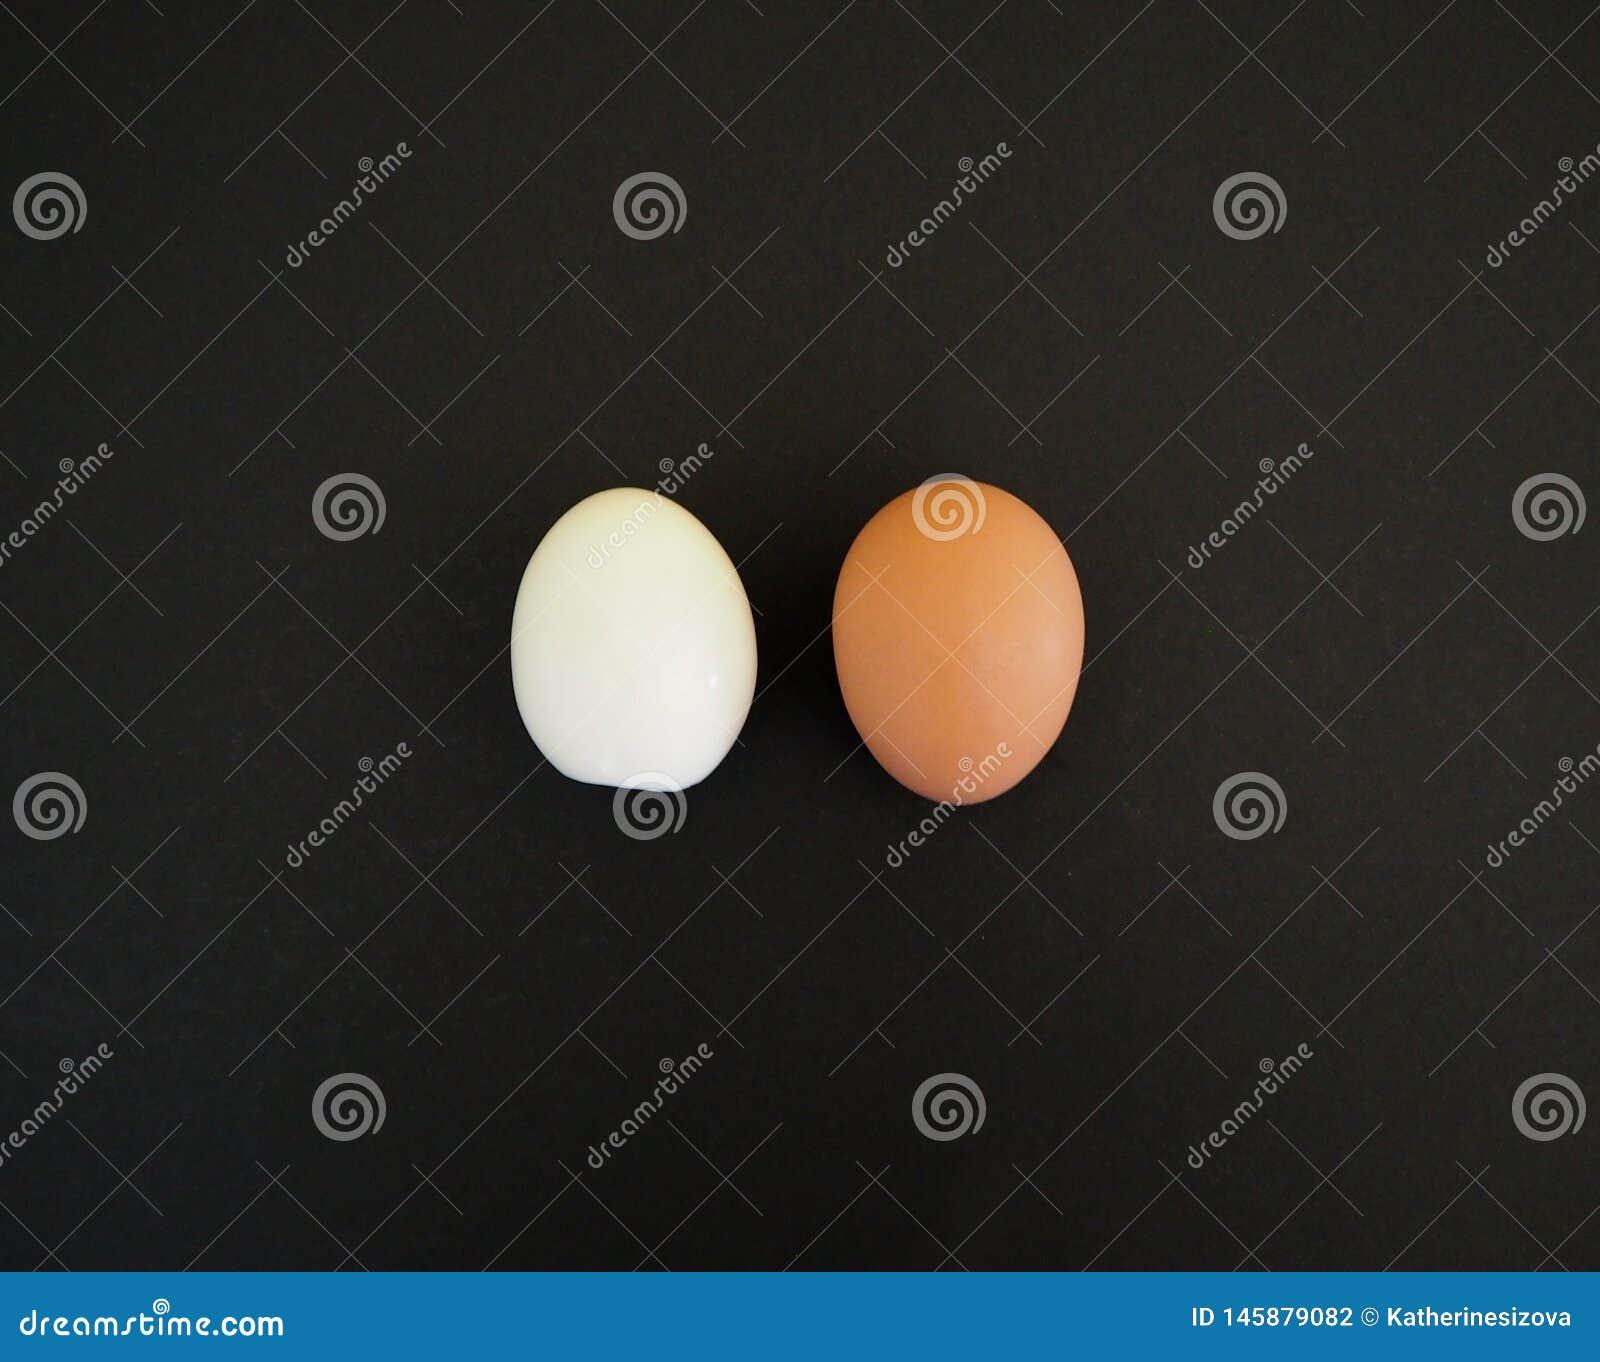 Одно целое яйцо и одно яйцо без eggshell на черноте